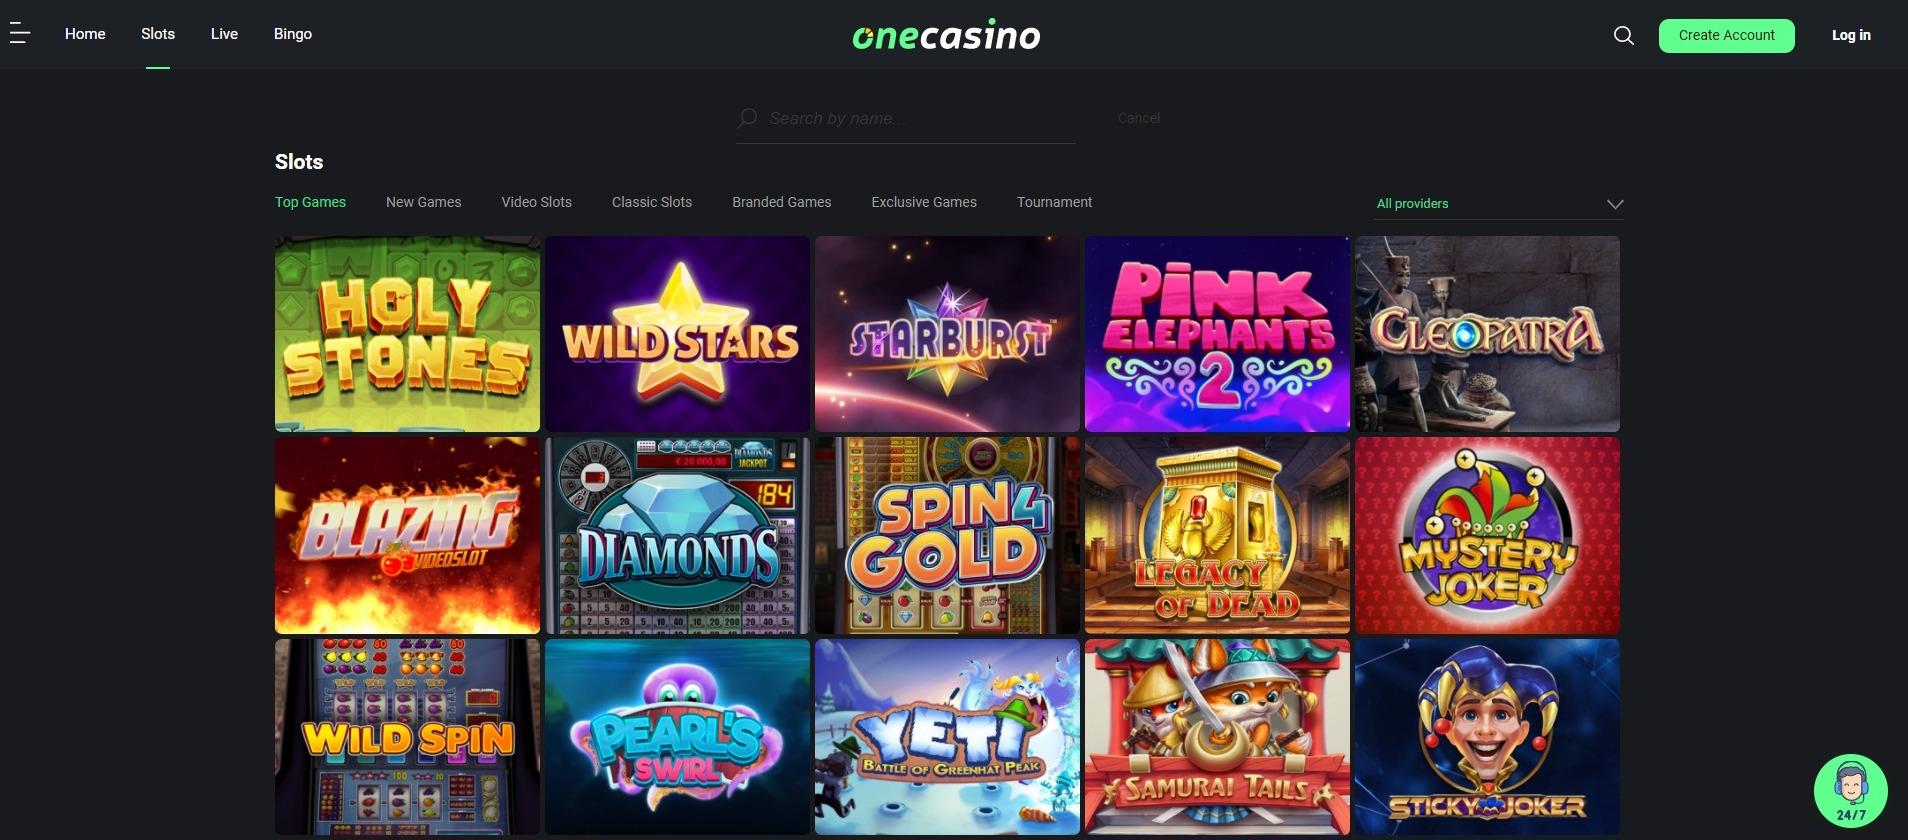 onecasino games